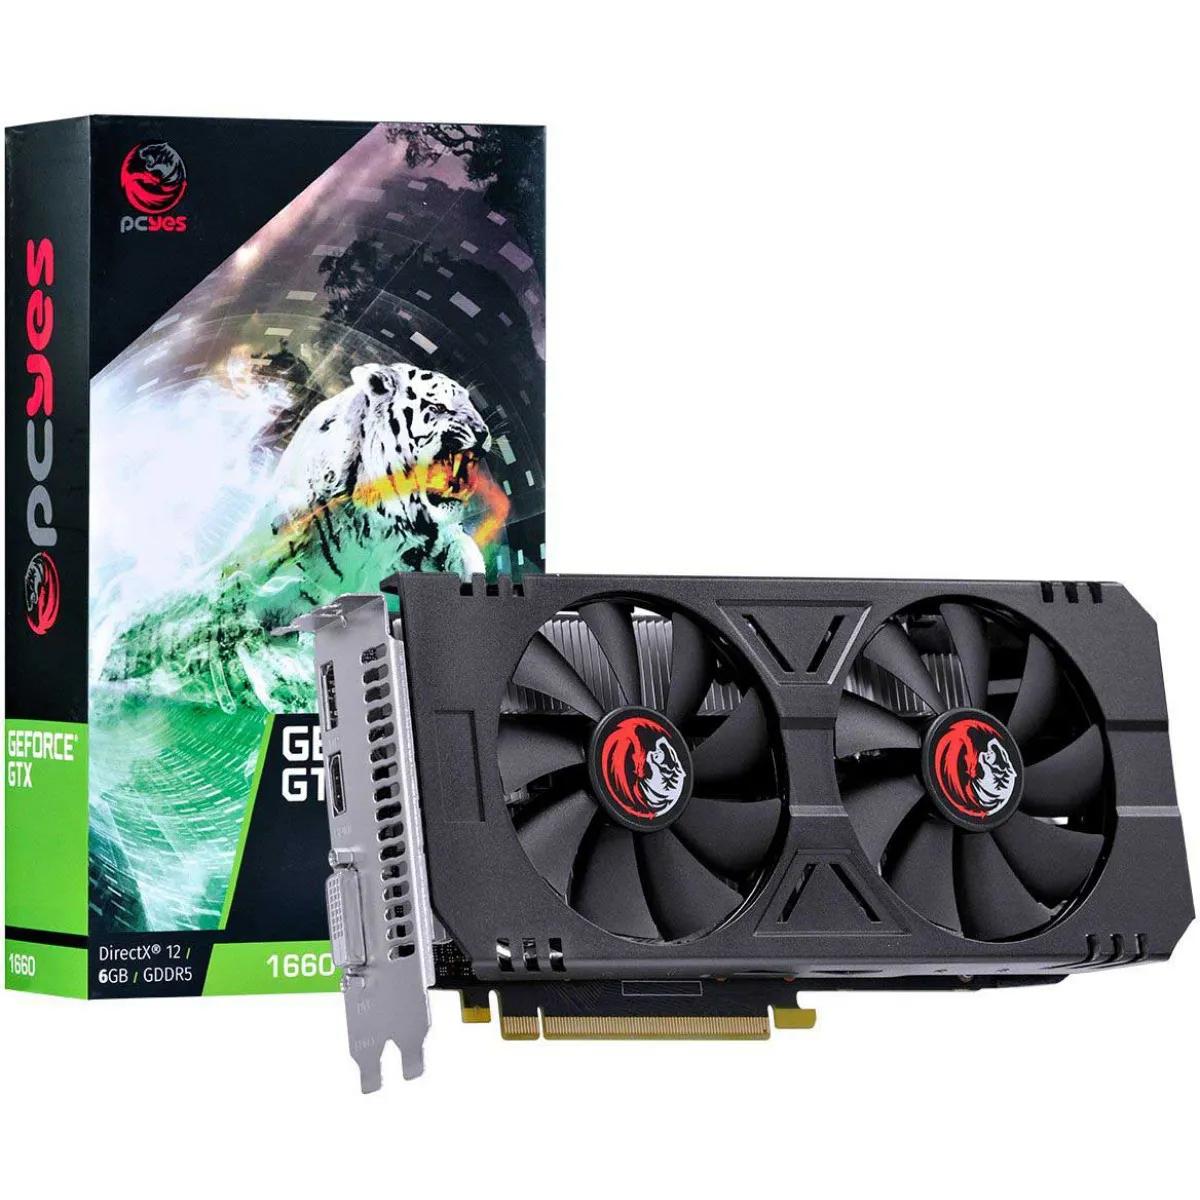 Placa de Vídeo PcYes GeForce GTX 1660 Dual 6GB GDDR5 192Bit PA166019206G5